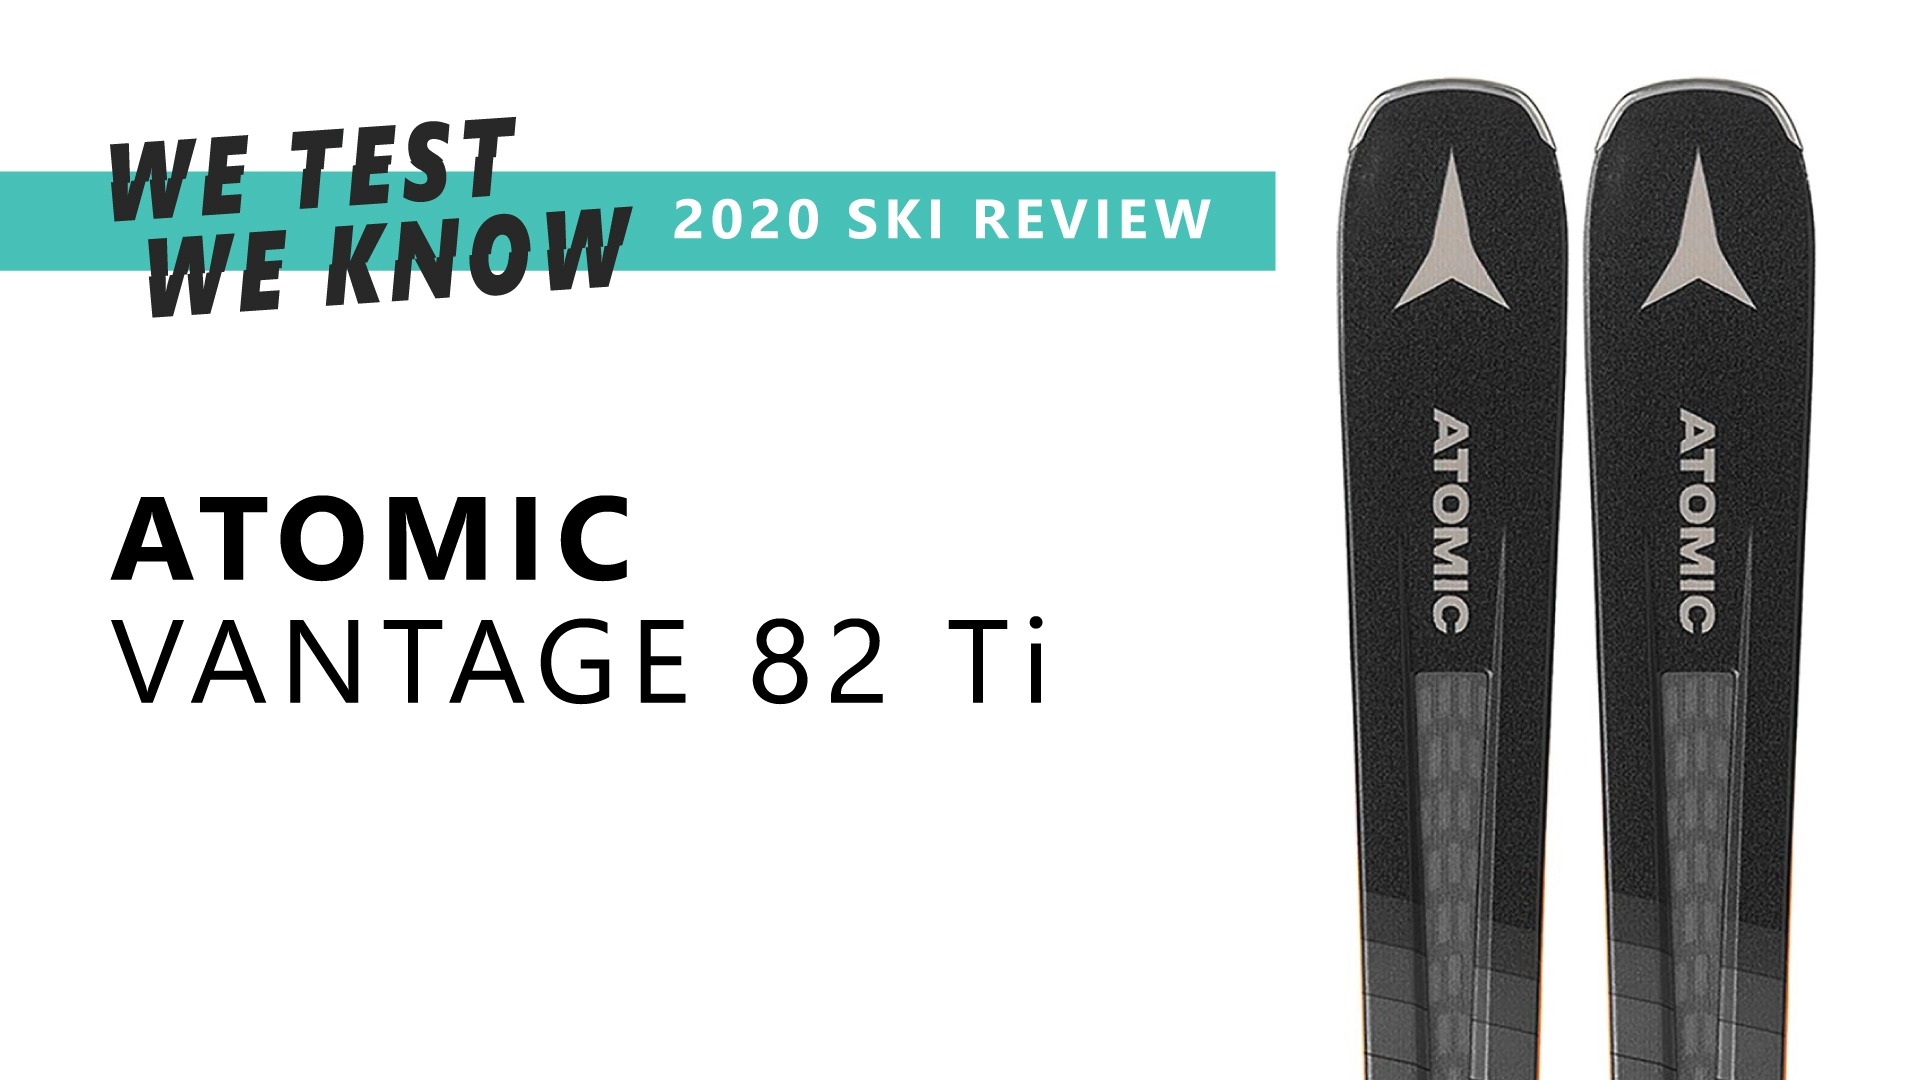 Atomic Vantage 82 Ti - 2020 Ski Review